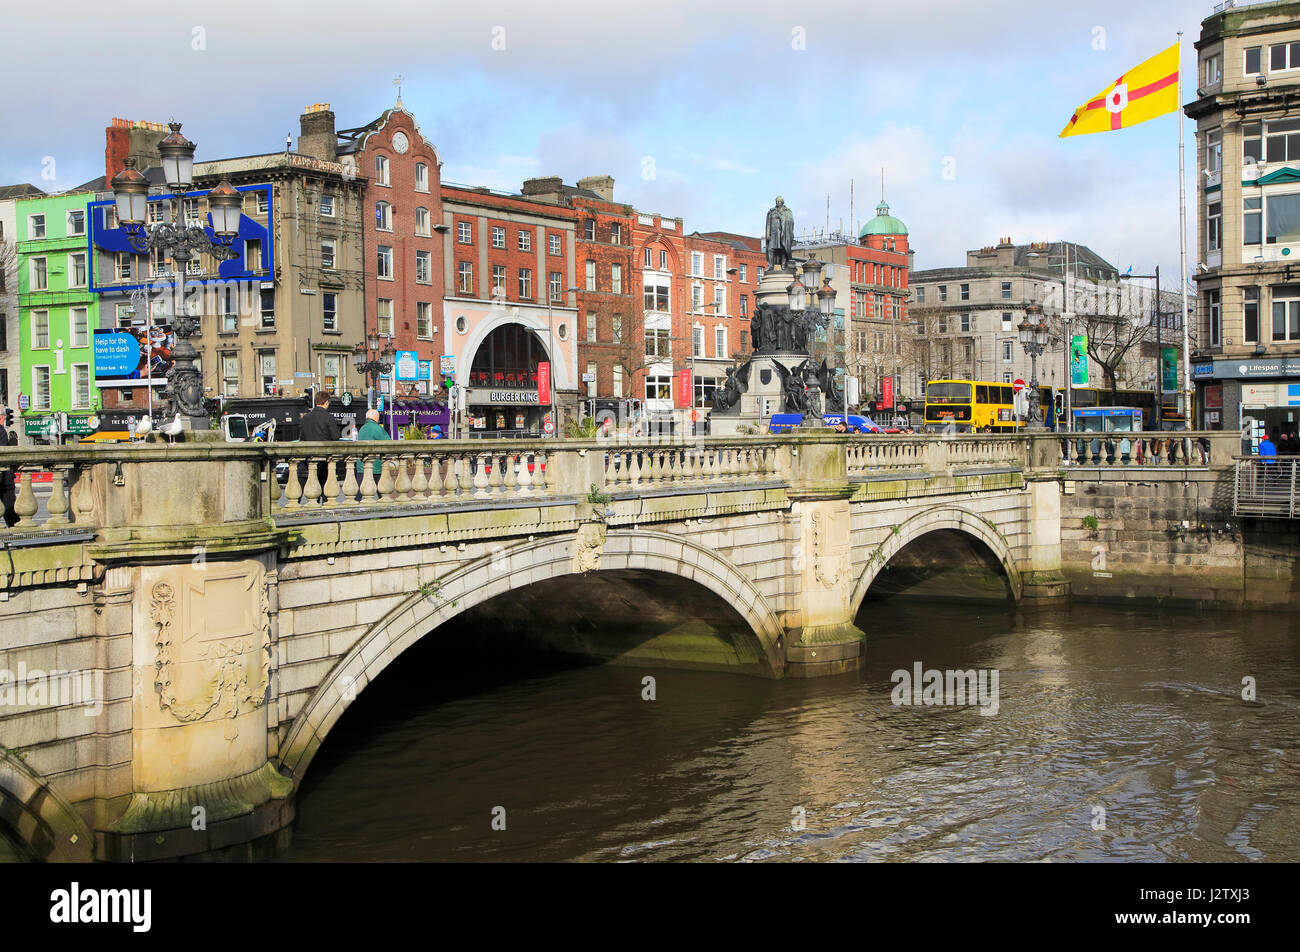 O'Connell Bridge, River Liffey, city of Dublin, Ireland, Irish Republic Stock Photo